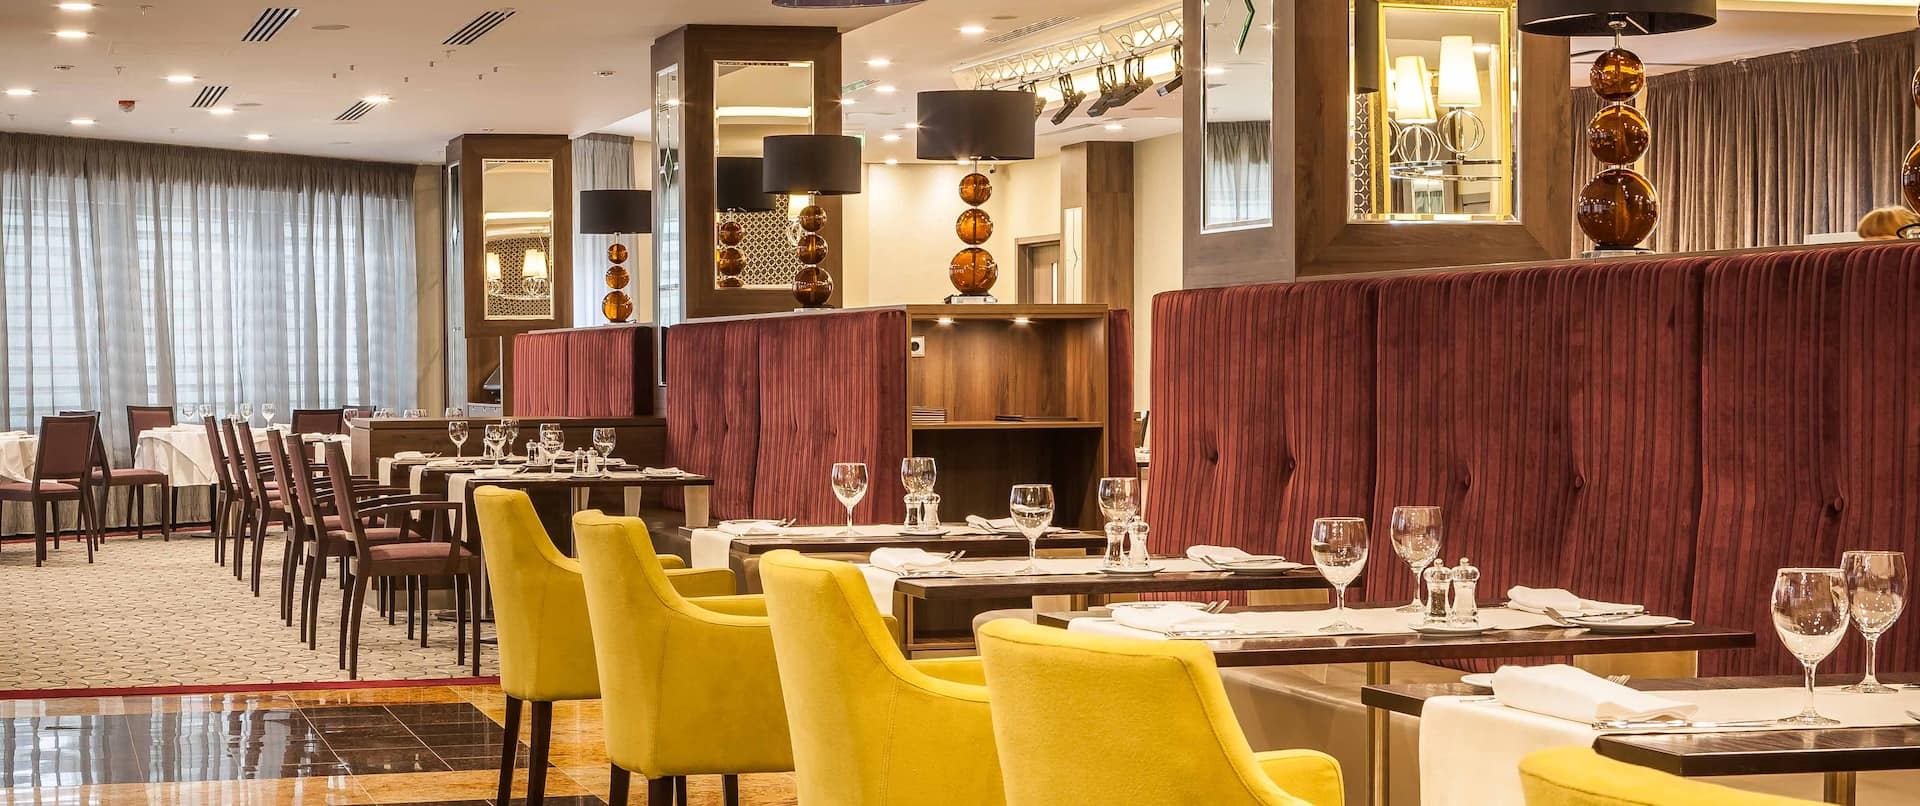 Restaurant Emerald